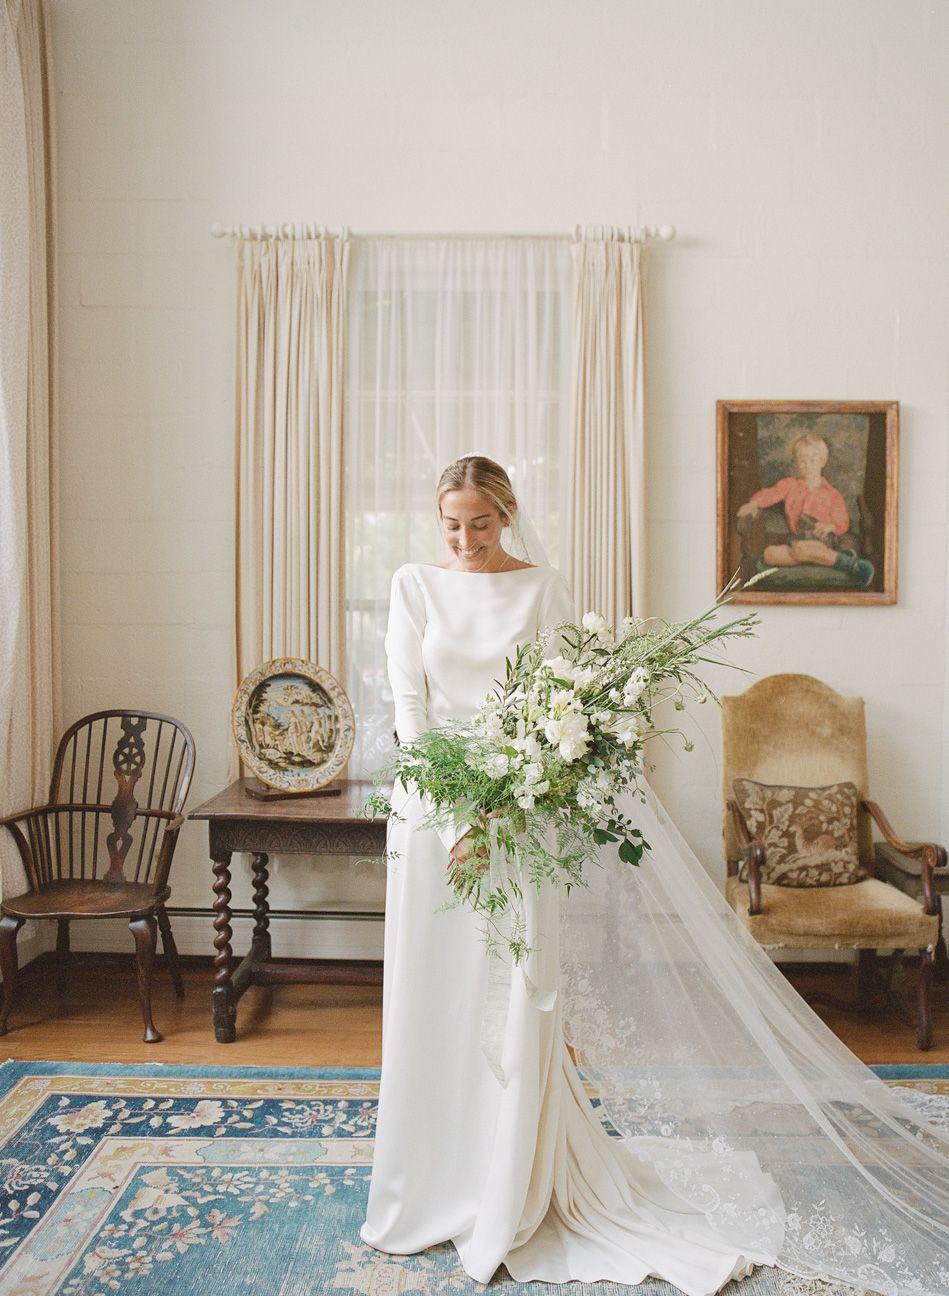 KarenHillPhotography-Nassikas-Wedding-SP-0020.jpg